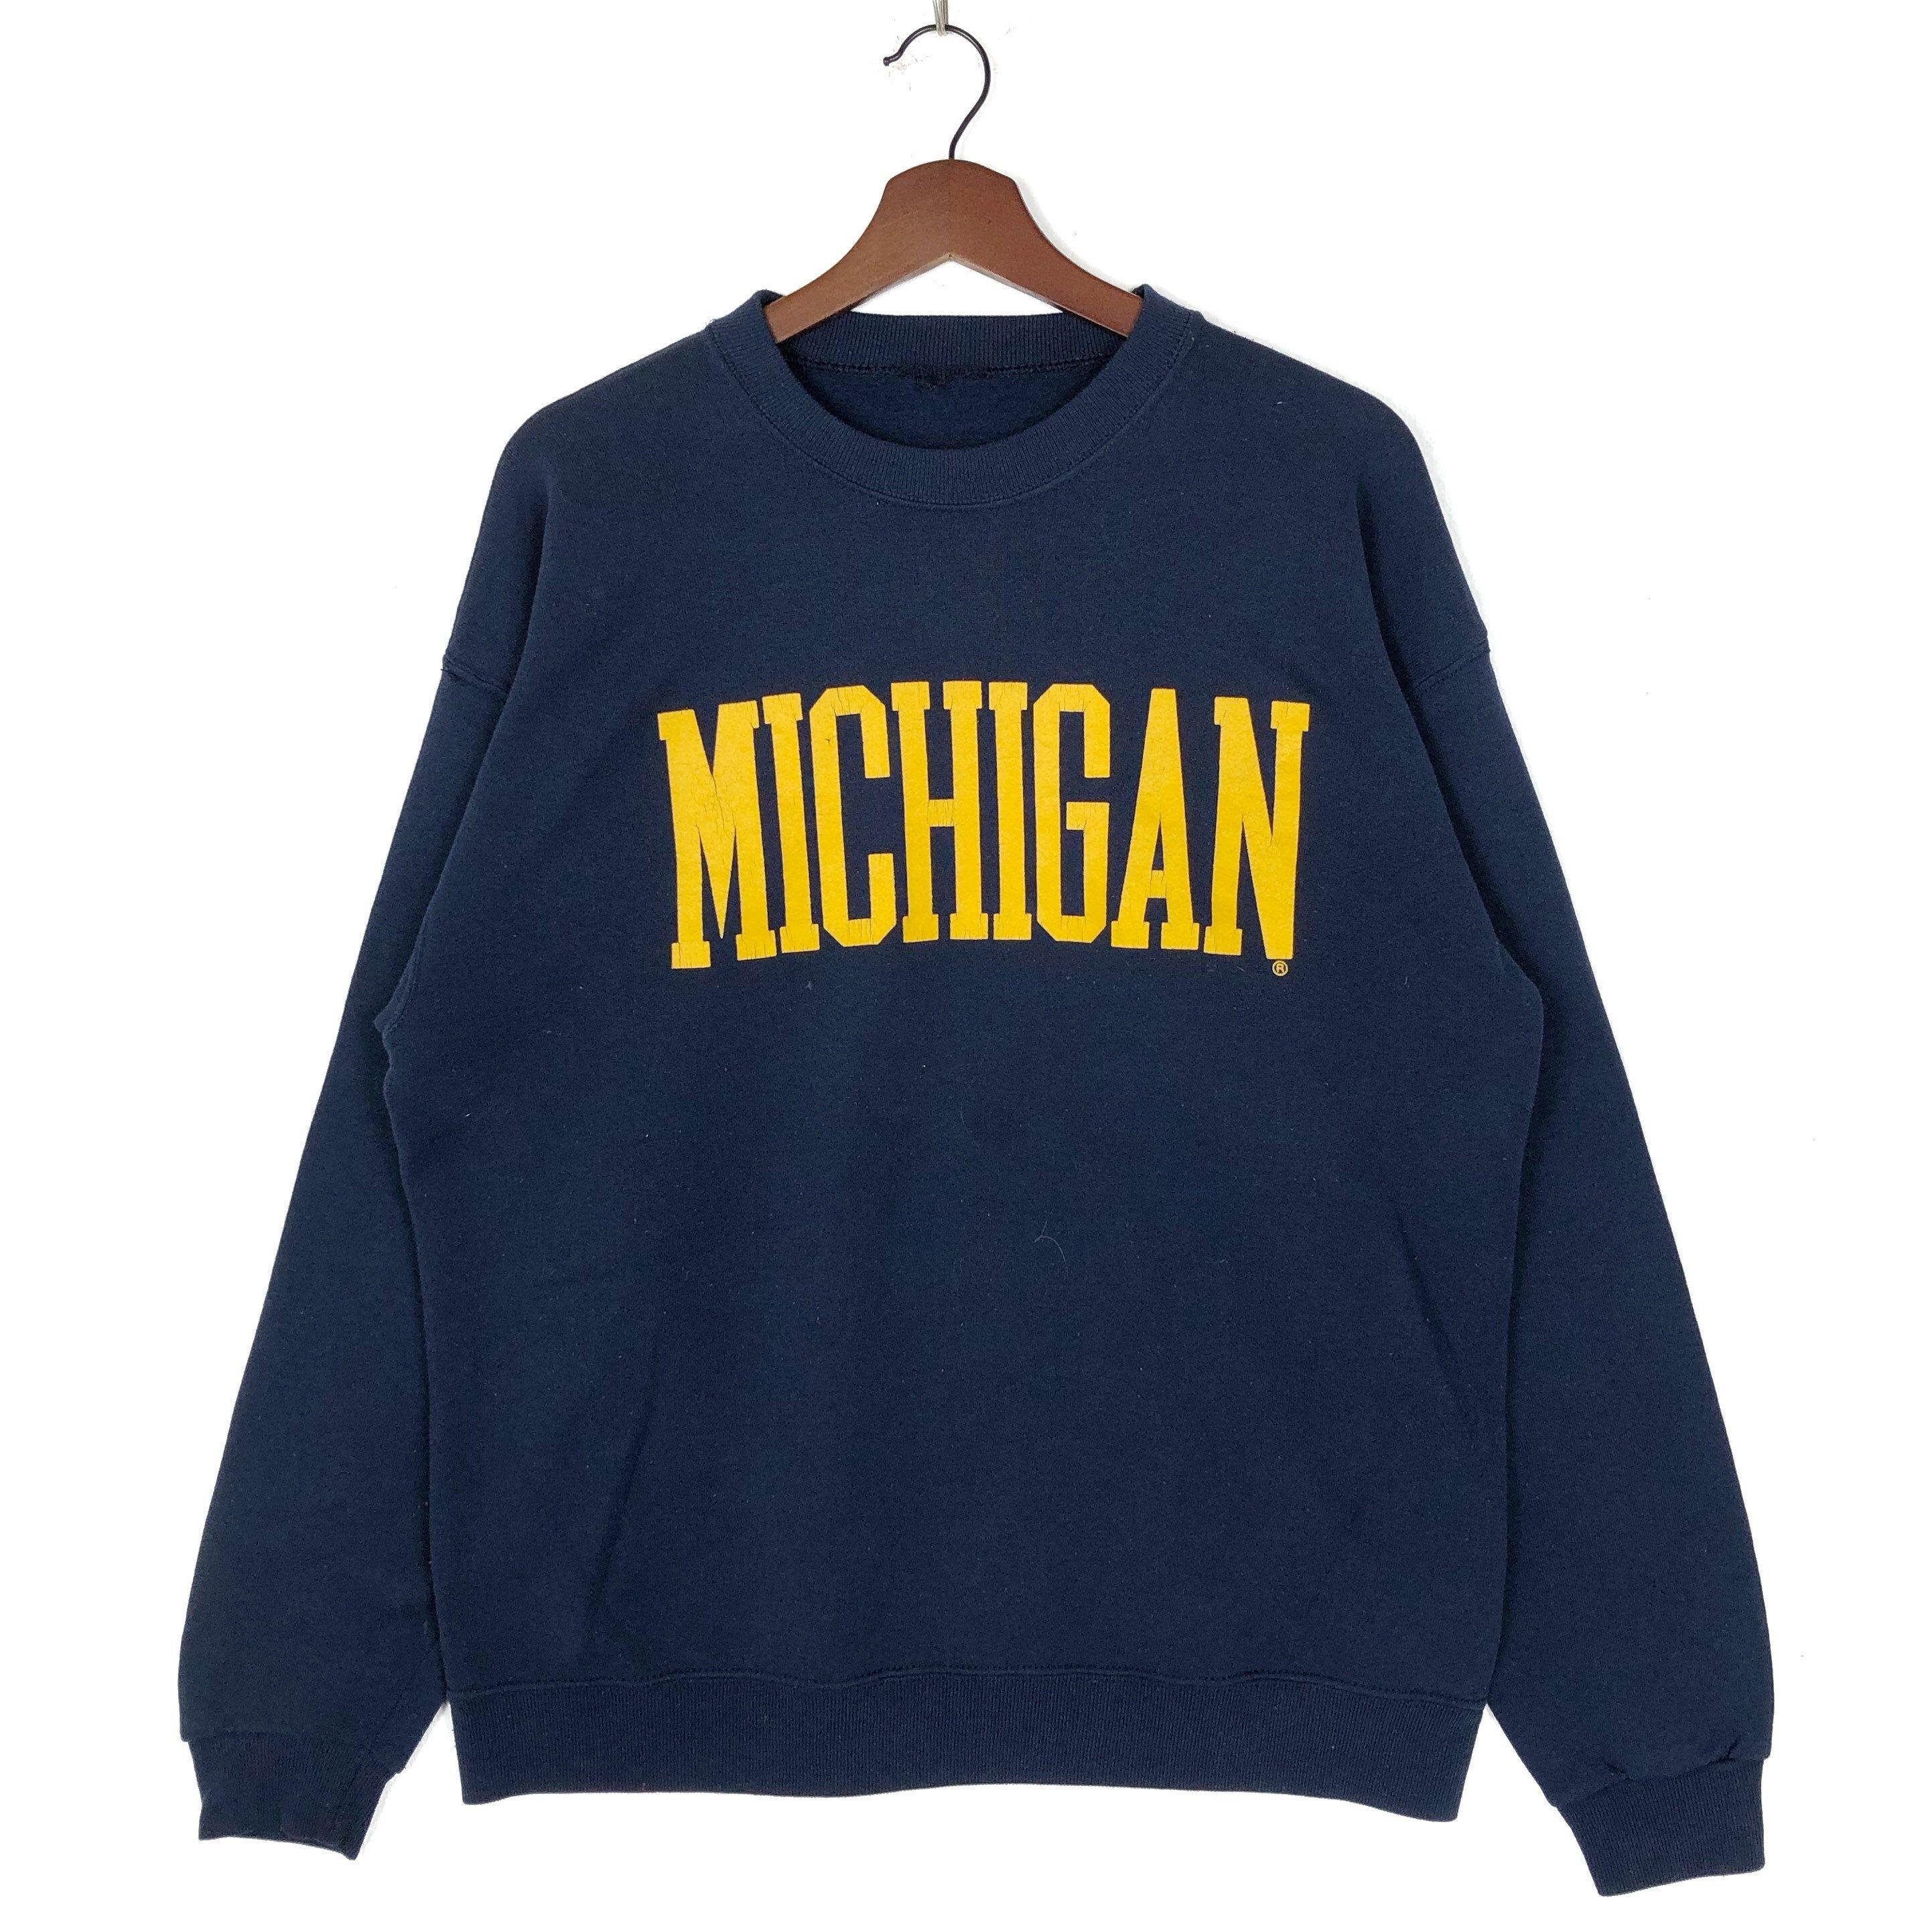 Vintage Michigan Sweatshirt Crewneck Big Spell Out Michigan Pullover Jumper Michigan Sweatshirt Sweatshirts Vintage Michigan [ 2884 x 2884 Pixel ]